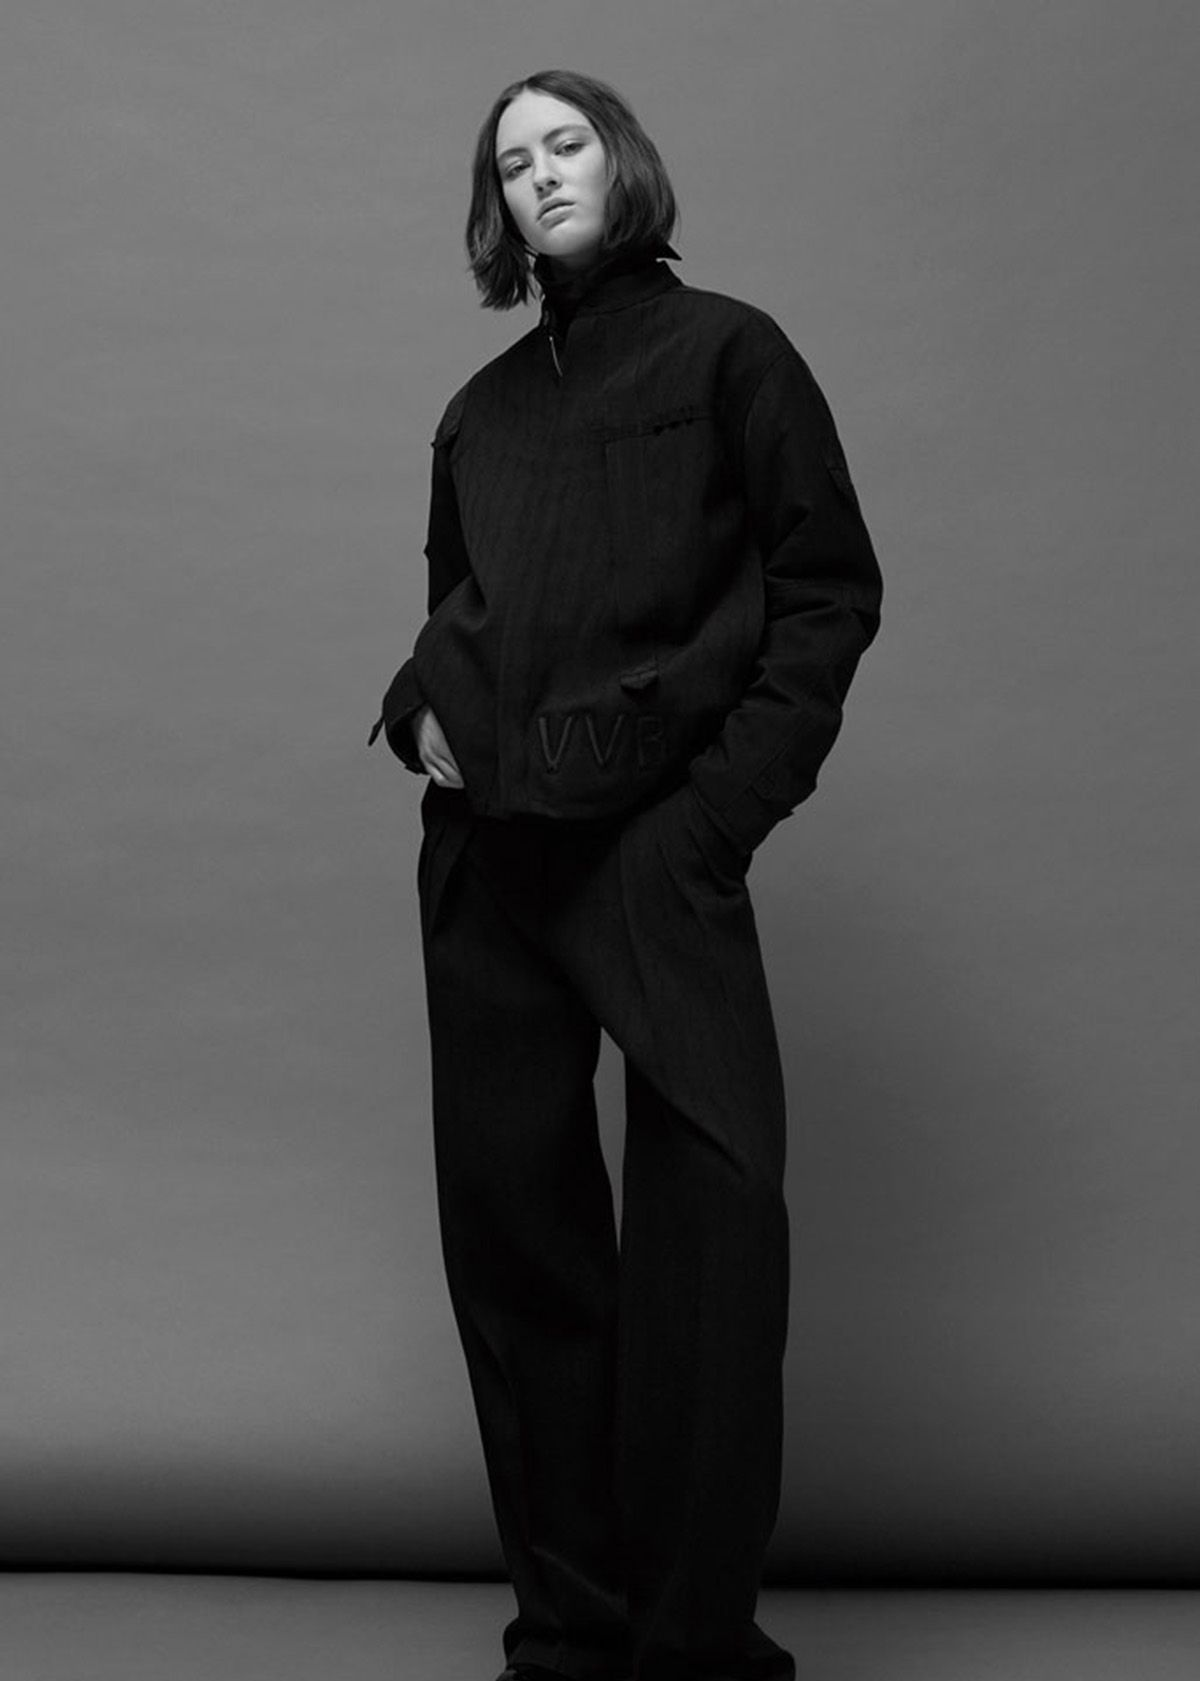 Victoria Victoria Beckham系列时装明暗对比的色调也再次被运用